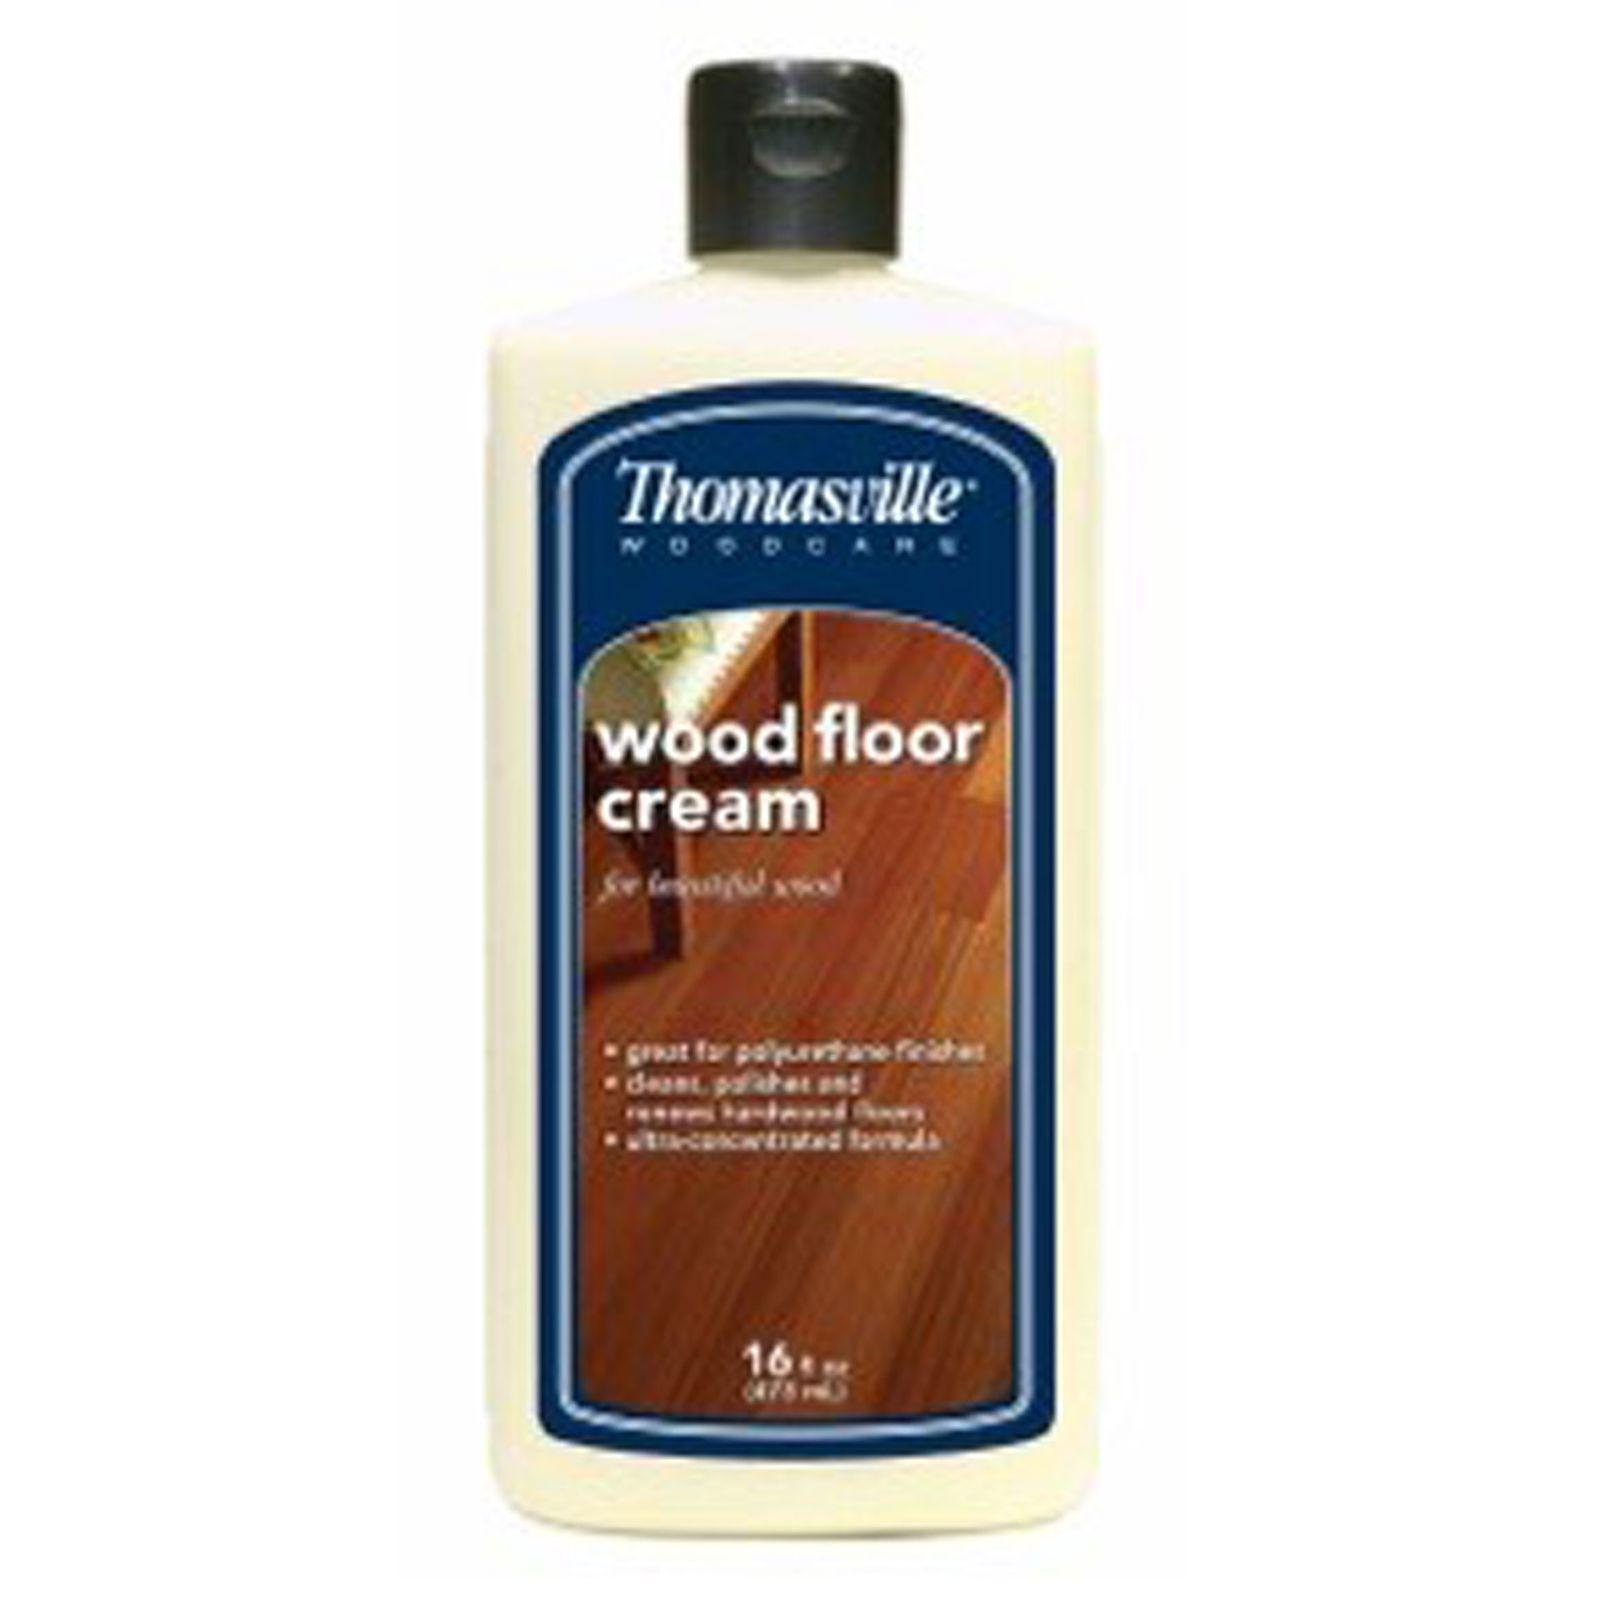 550082d9469b5 Ghk Thomasville Wood Floor Cream S2 16095926 Jpg